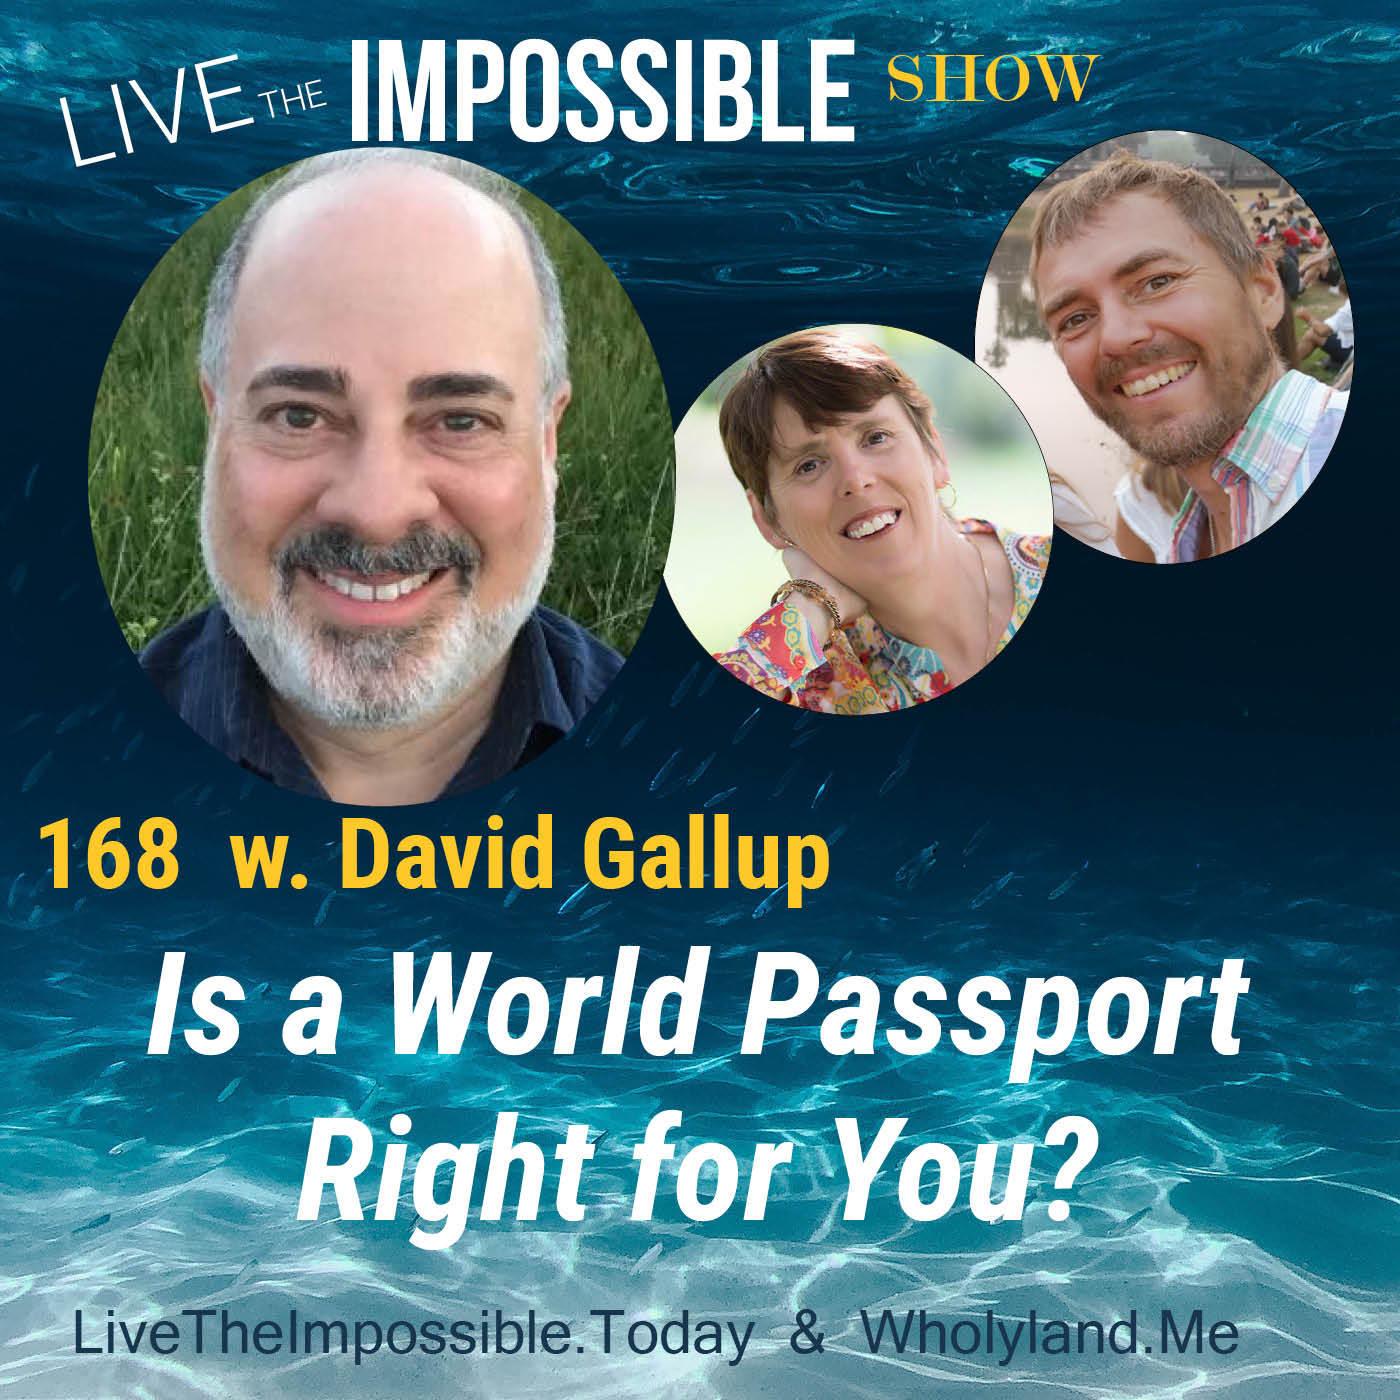 David Gallup